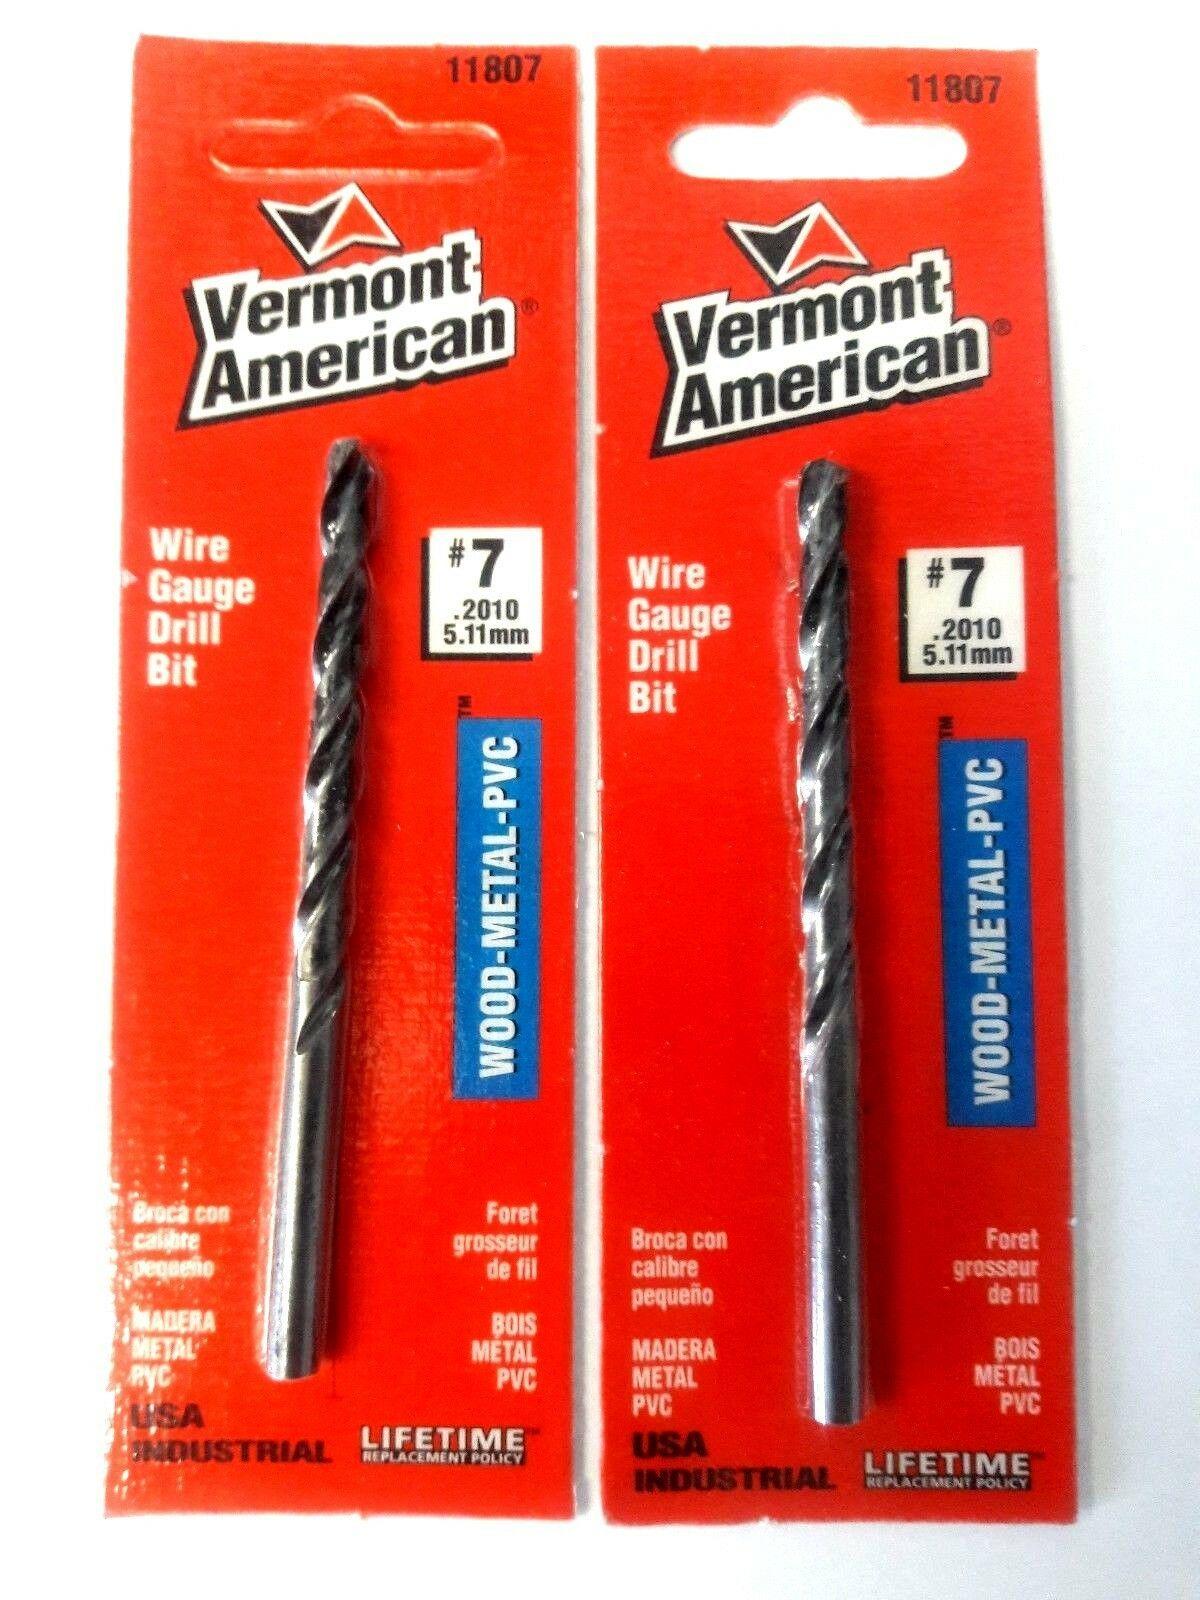 Vermont American 11807 #7 Wire Gauge Drill Bit USA 2PCS - $2.77